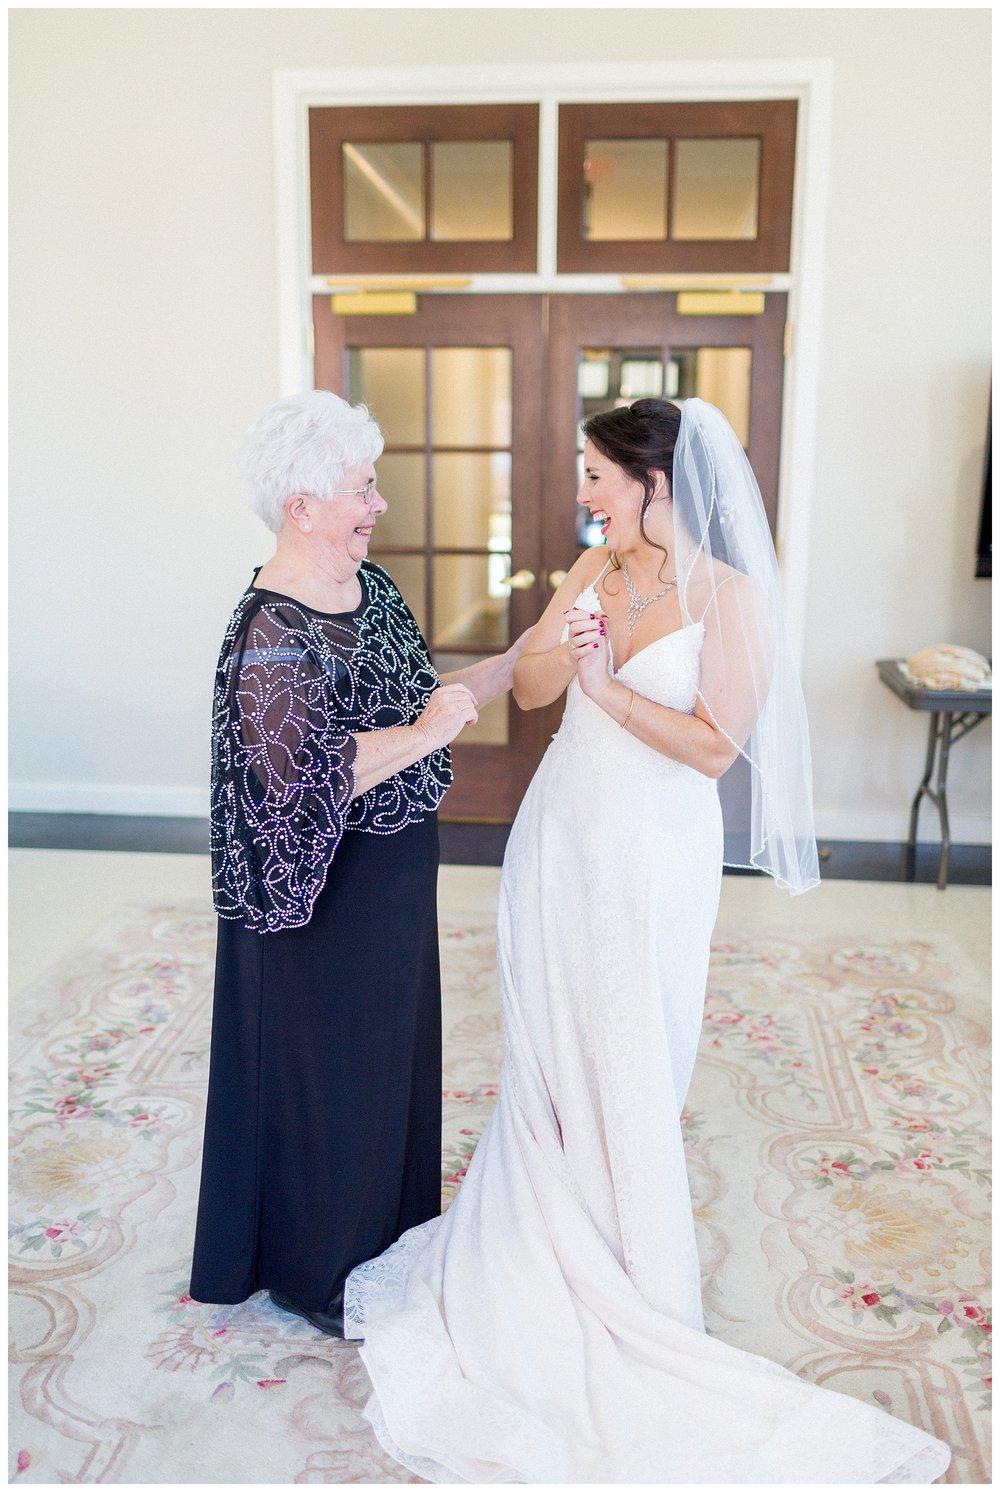 Stone Tower Winery Wedding | Virginia Winter Wedding | VA Wedding Photographer Kir Tuben_0035.jpg